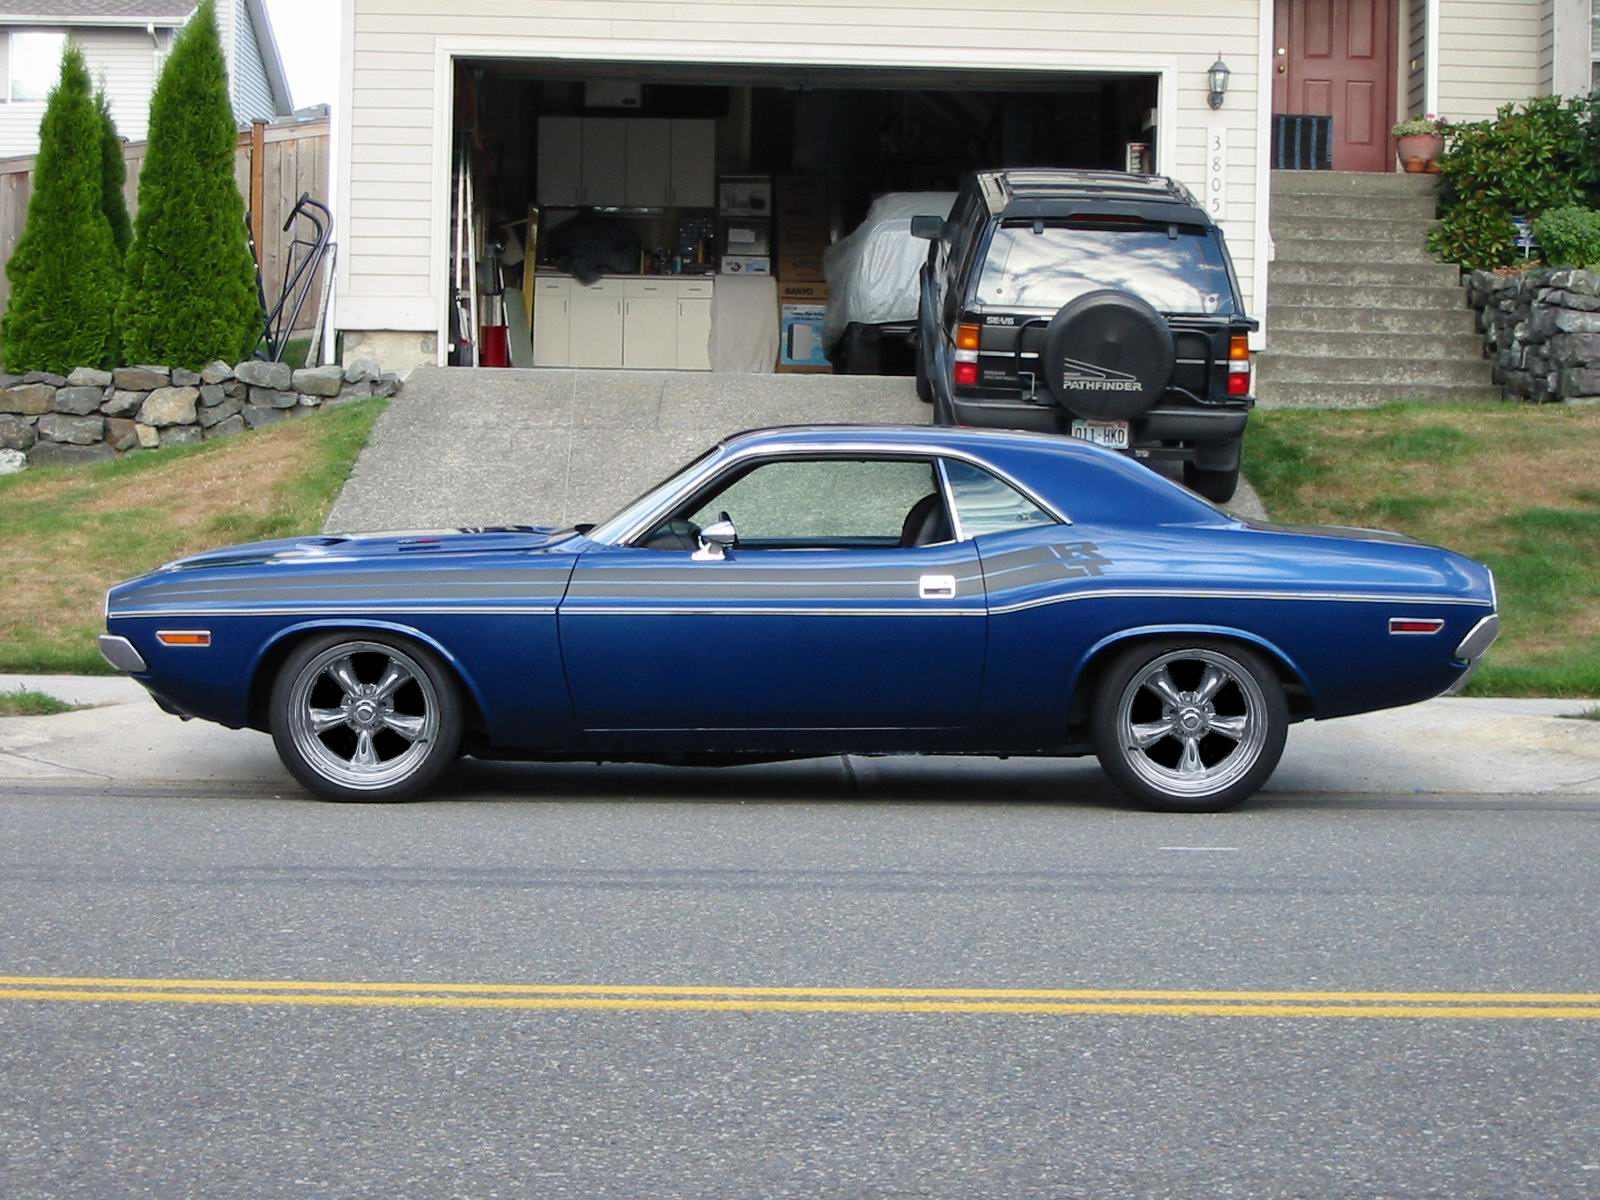 Dodge Challenger Convertible >> 71 Challenger Restoration: Photos of 71 Challenger Resto